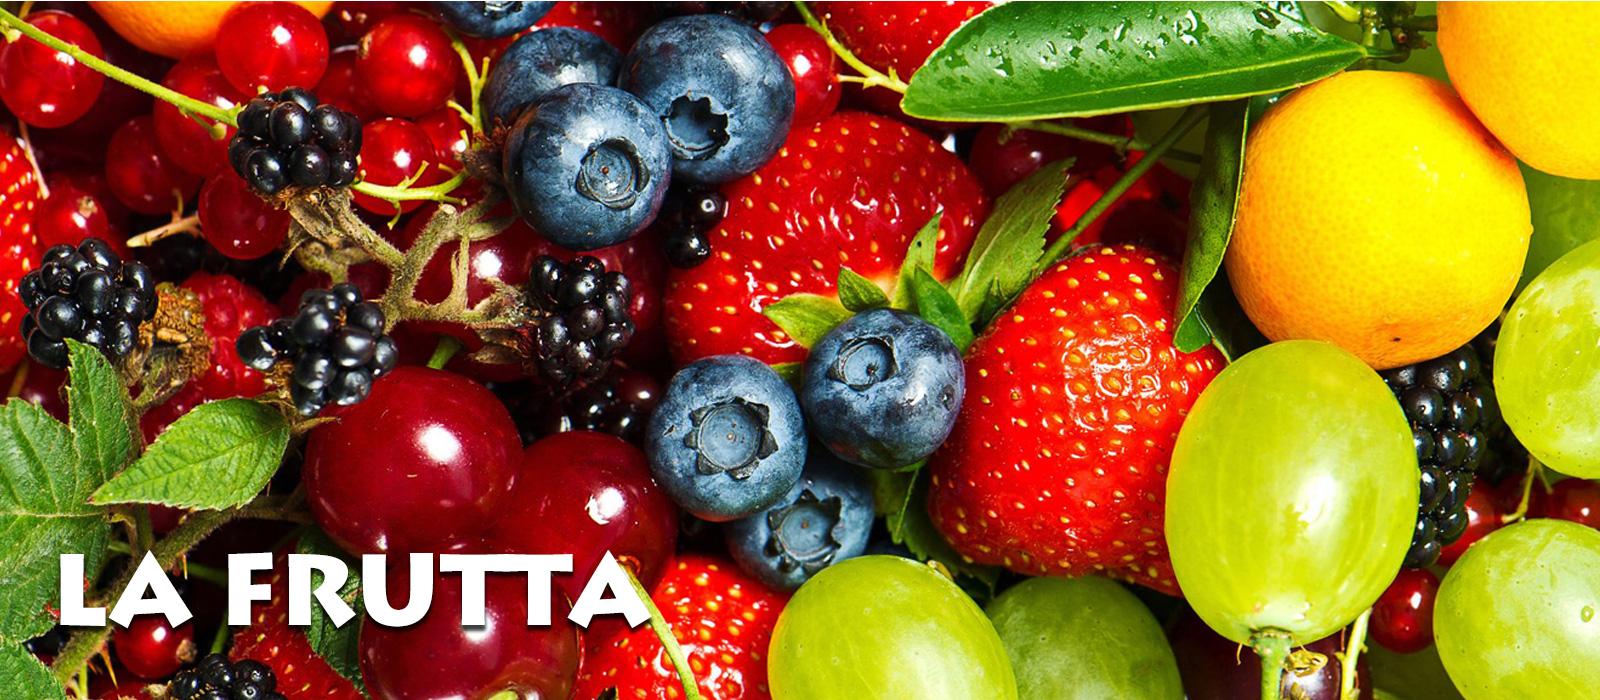 la-frutta-1600x700-1